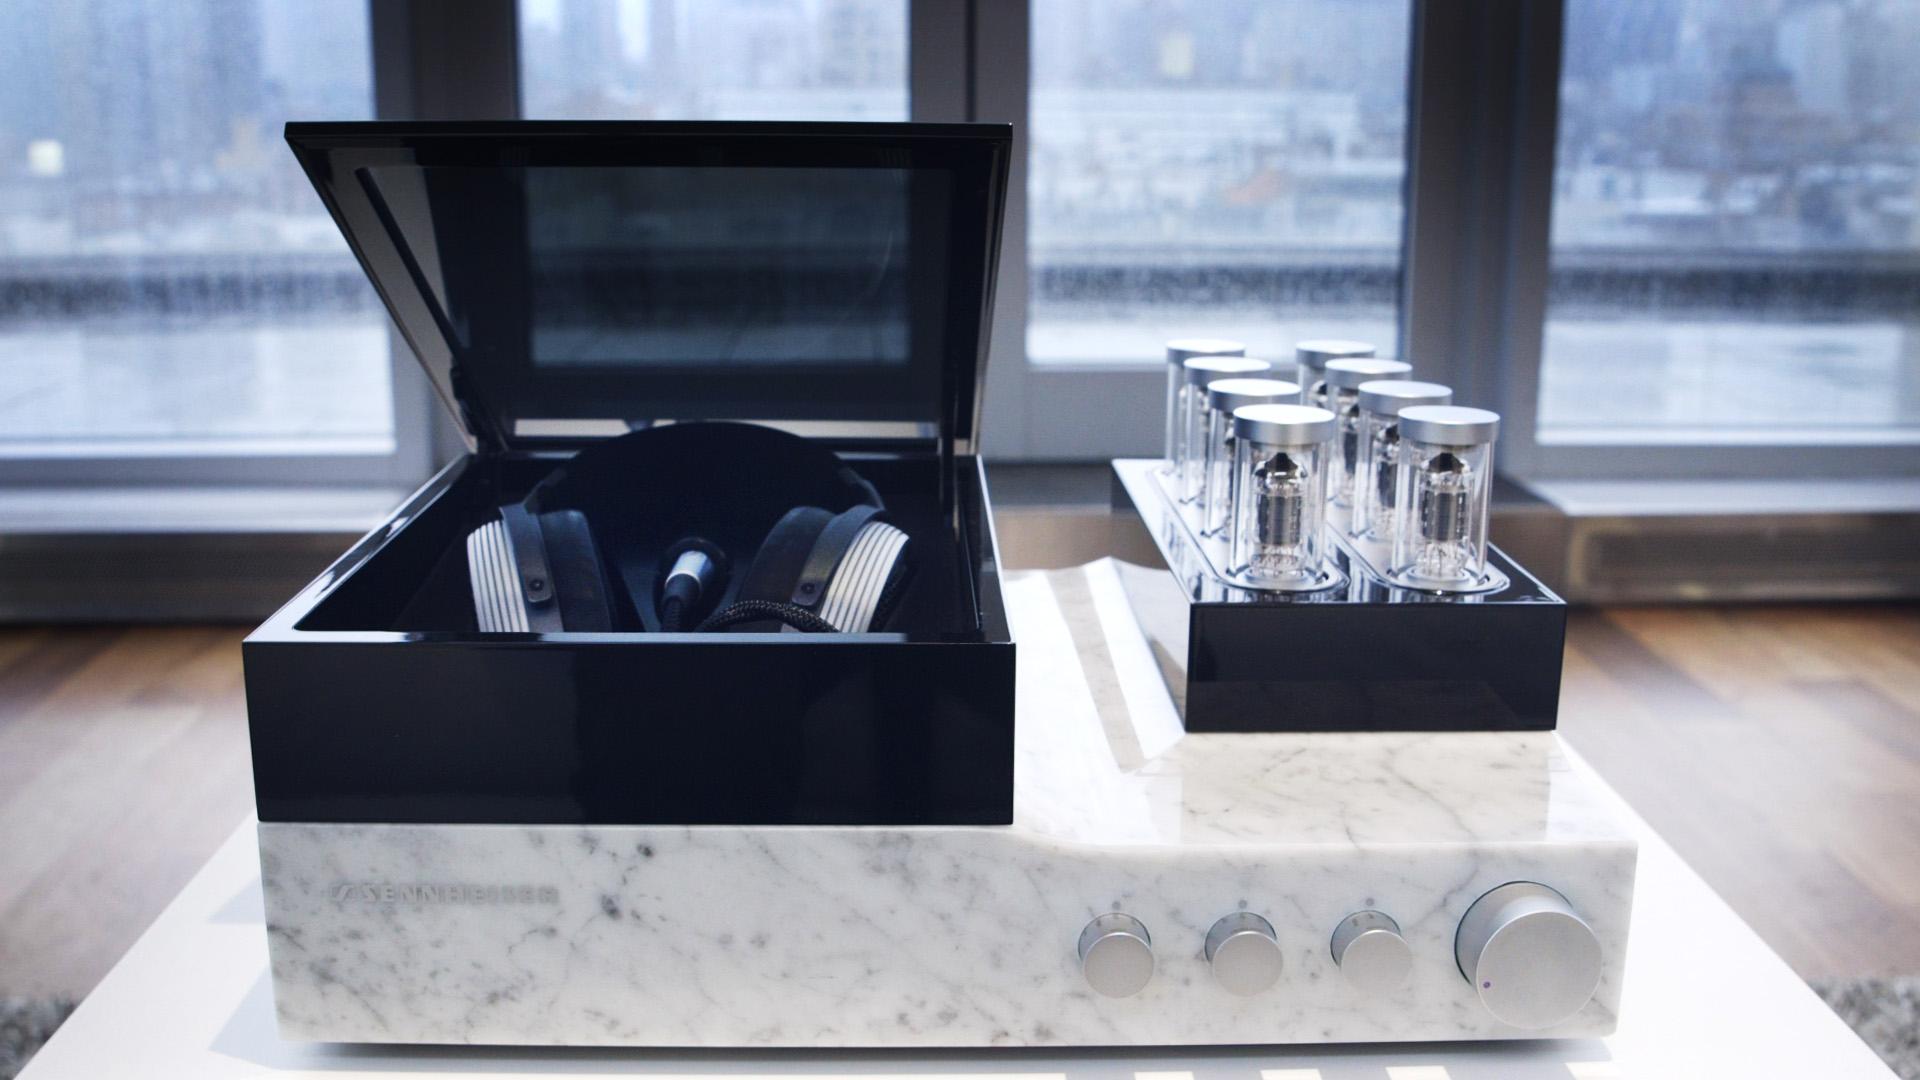 Asia Carrera Marble new sennheiser orpheus: best headphone and amp combo